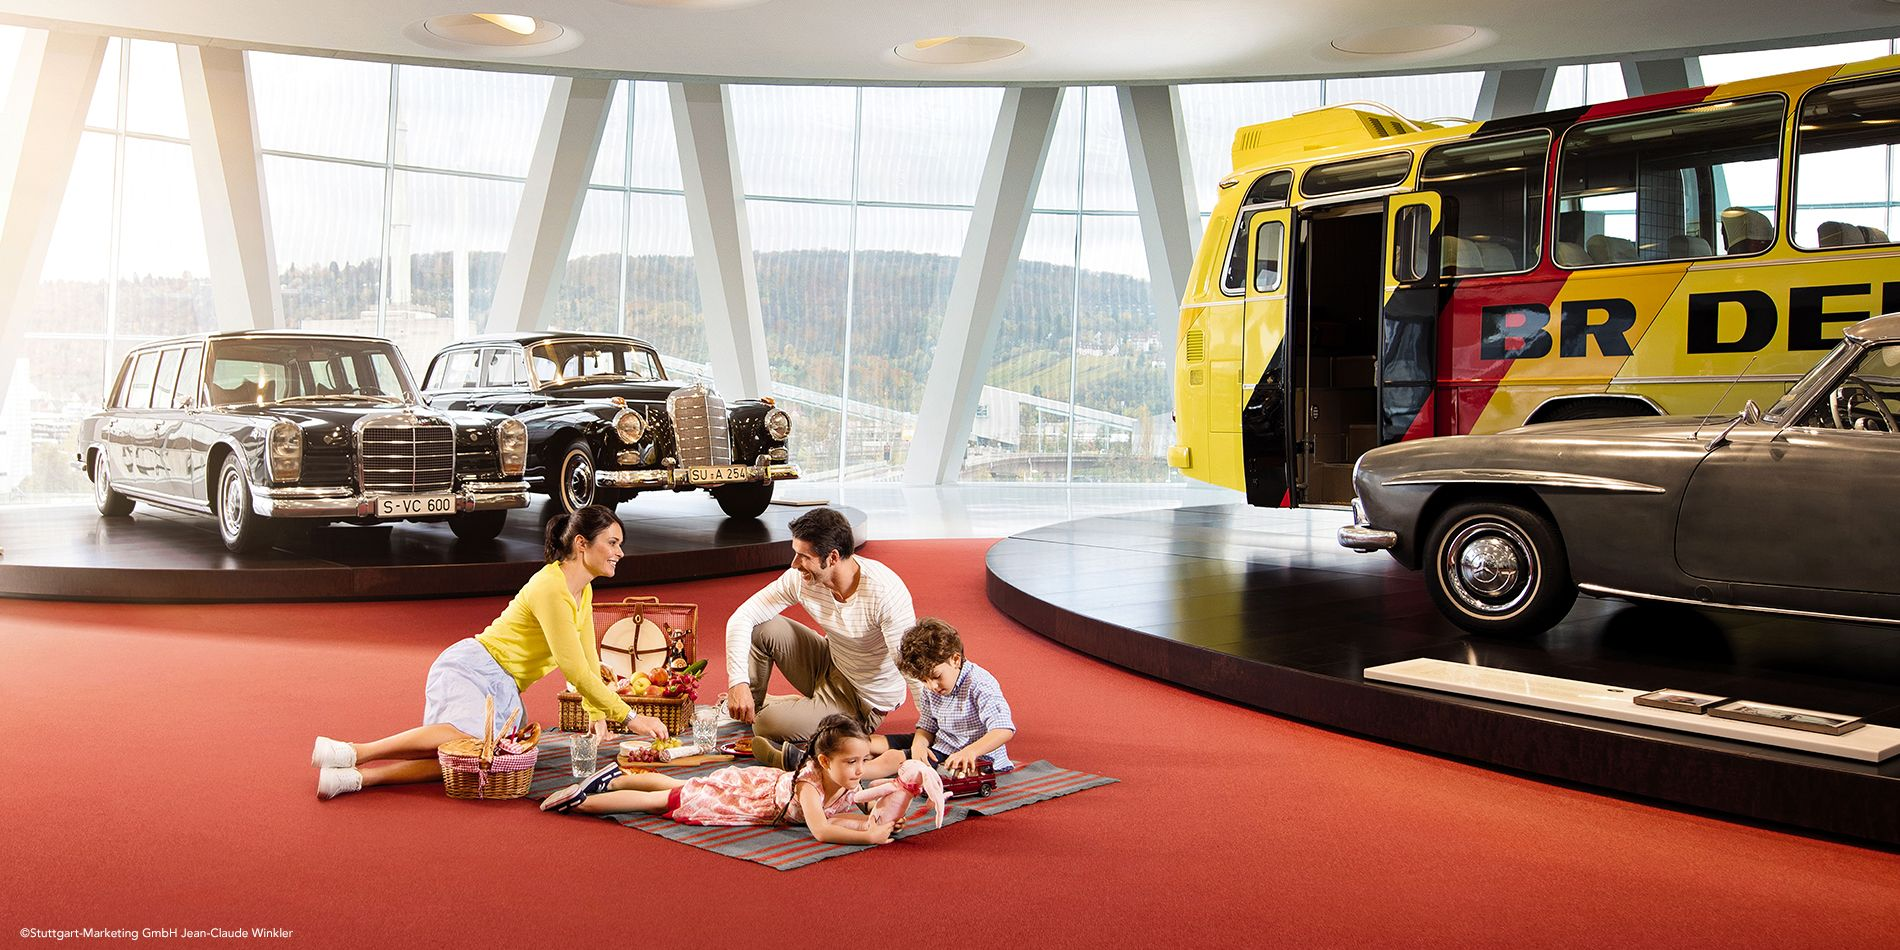 © Stuttgart-Marketing GmbH / Jean-Claude Winkler / Allemagne Tourisme